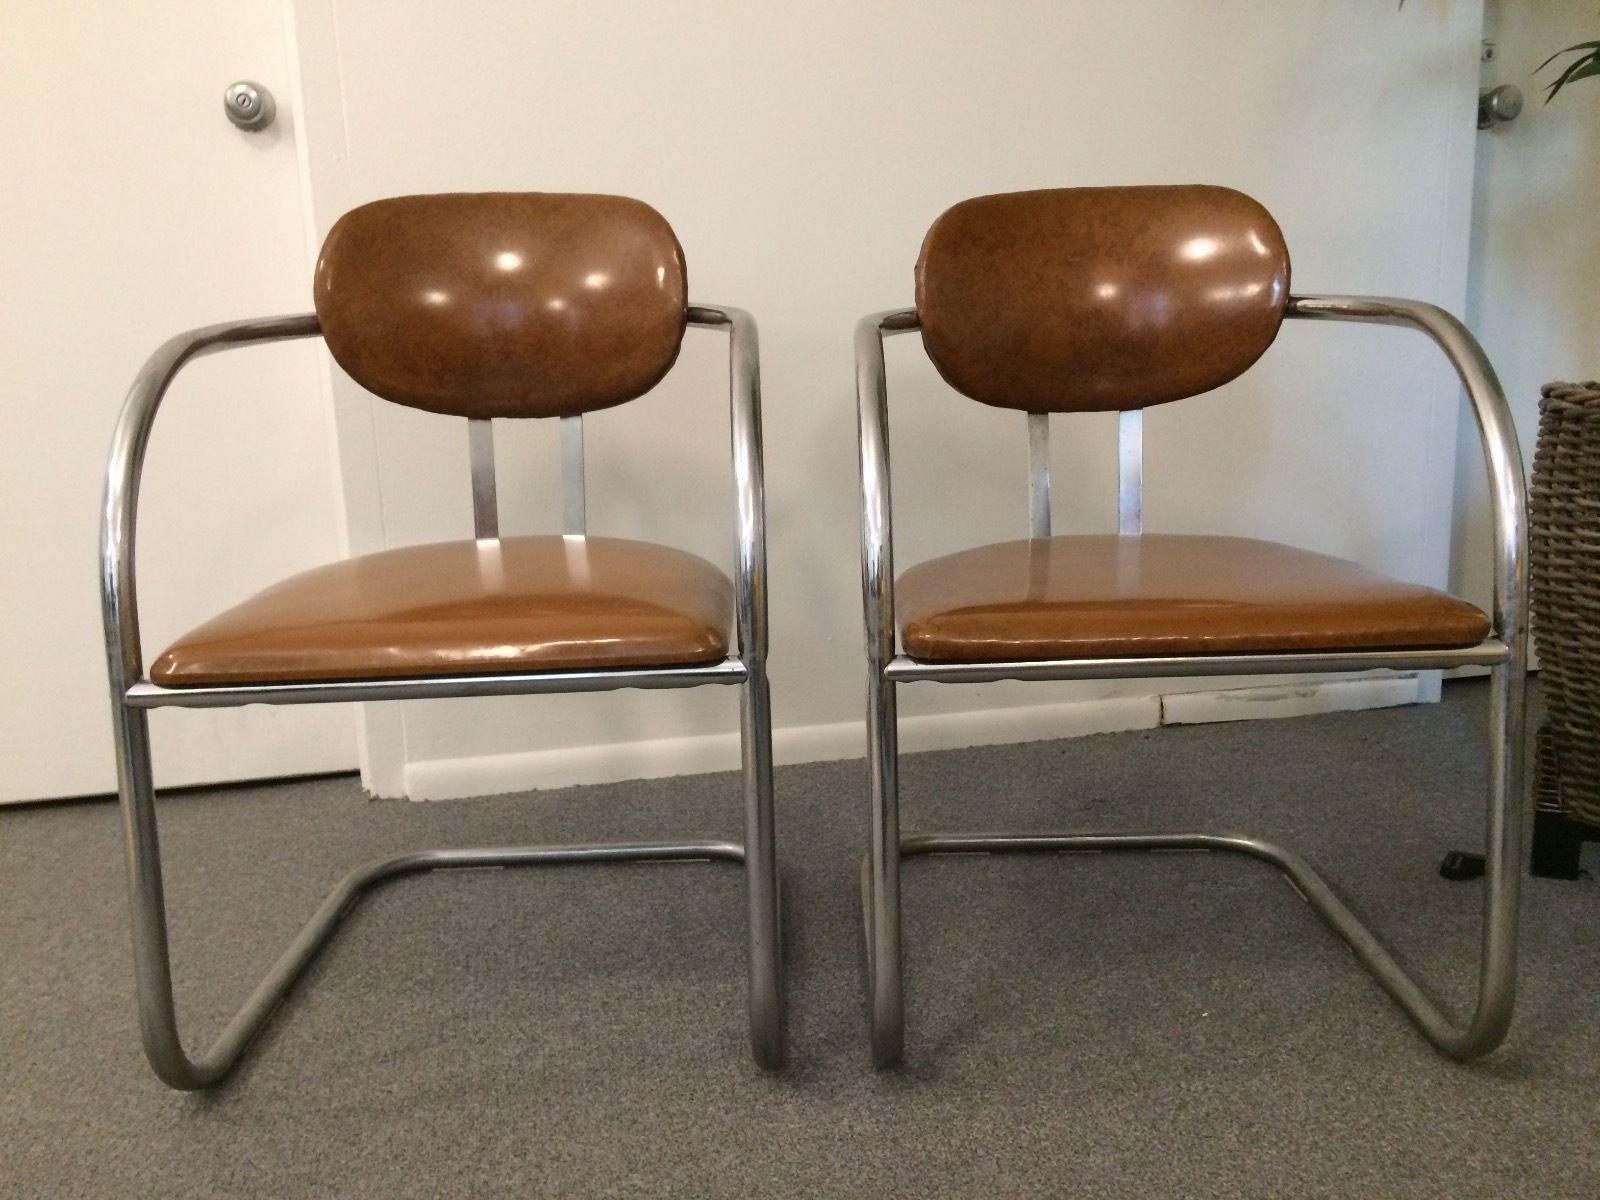 Chromcraft Revington : Furniture | Chromcraft | Pinterest